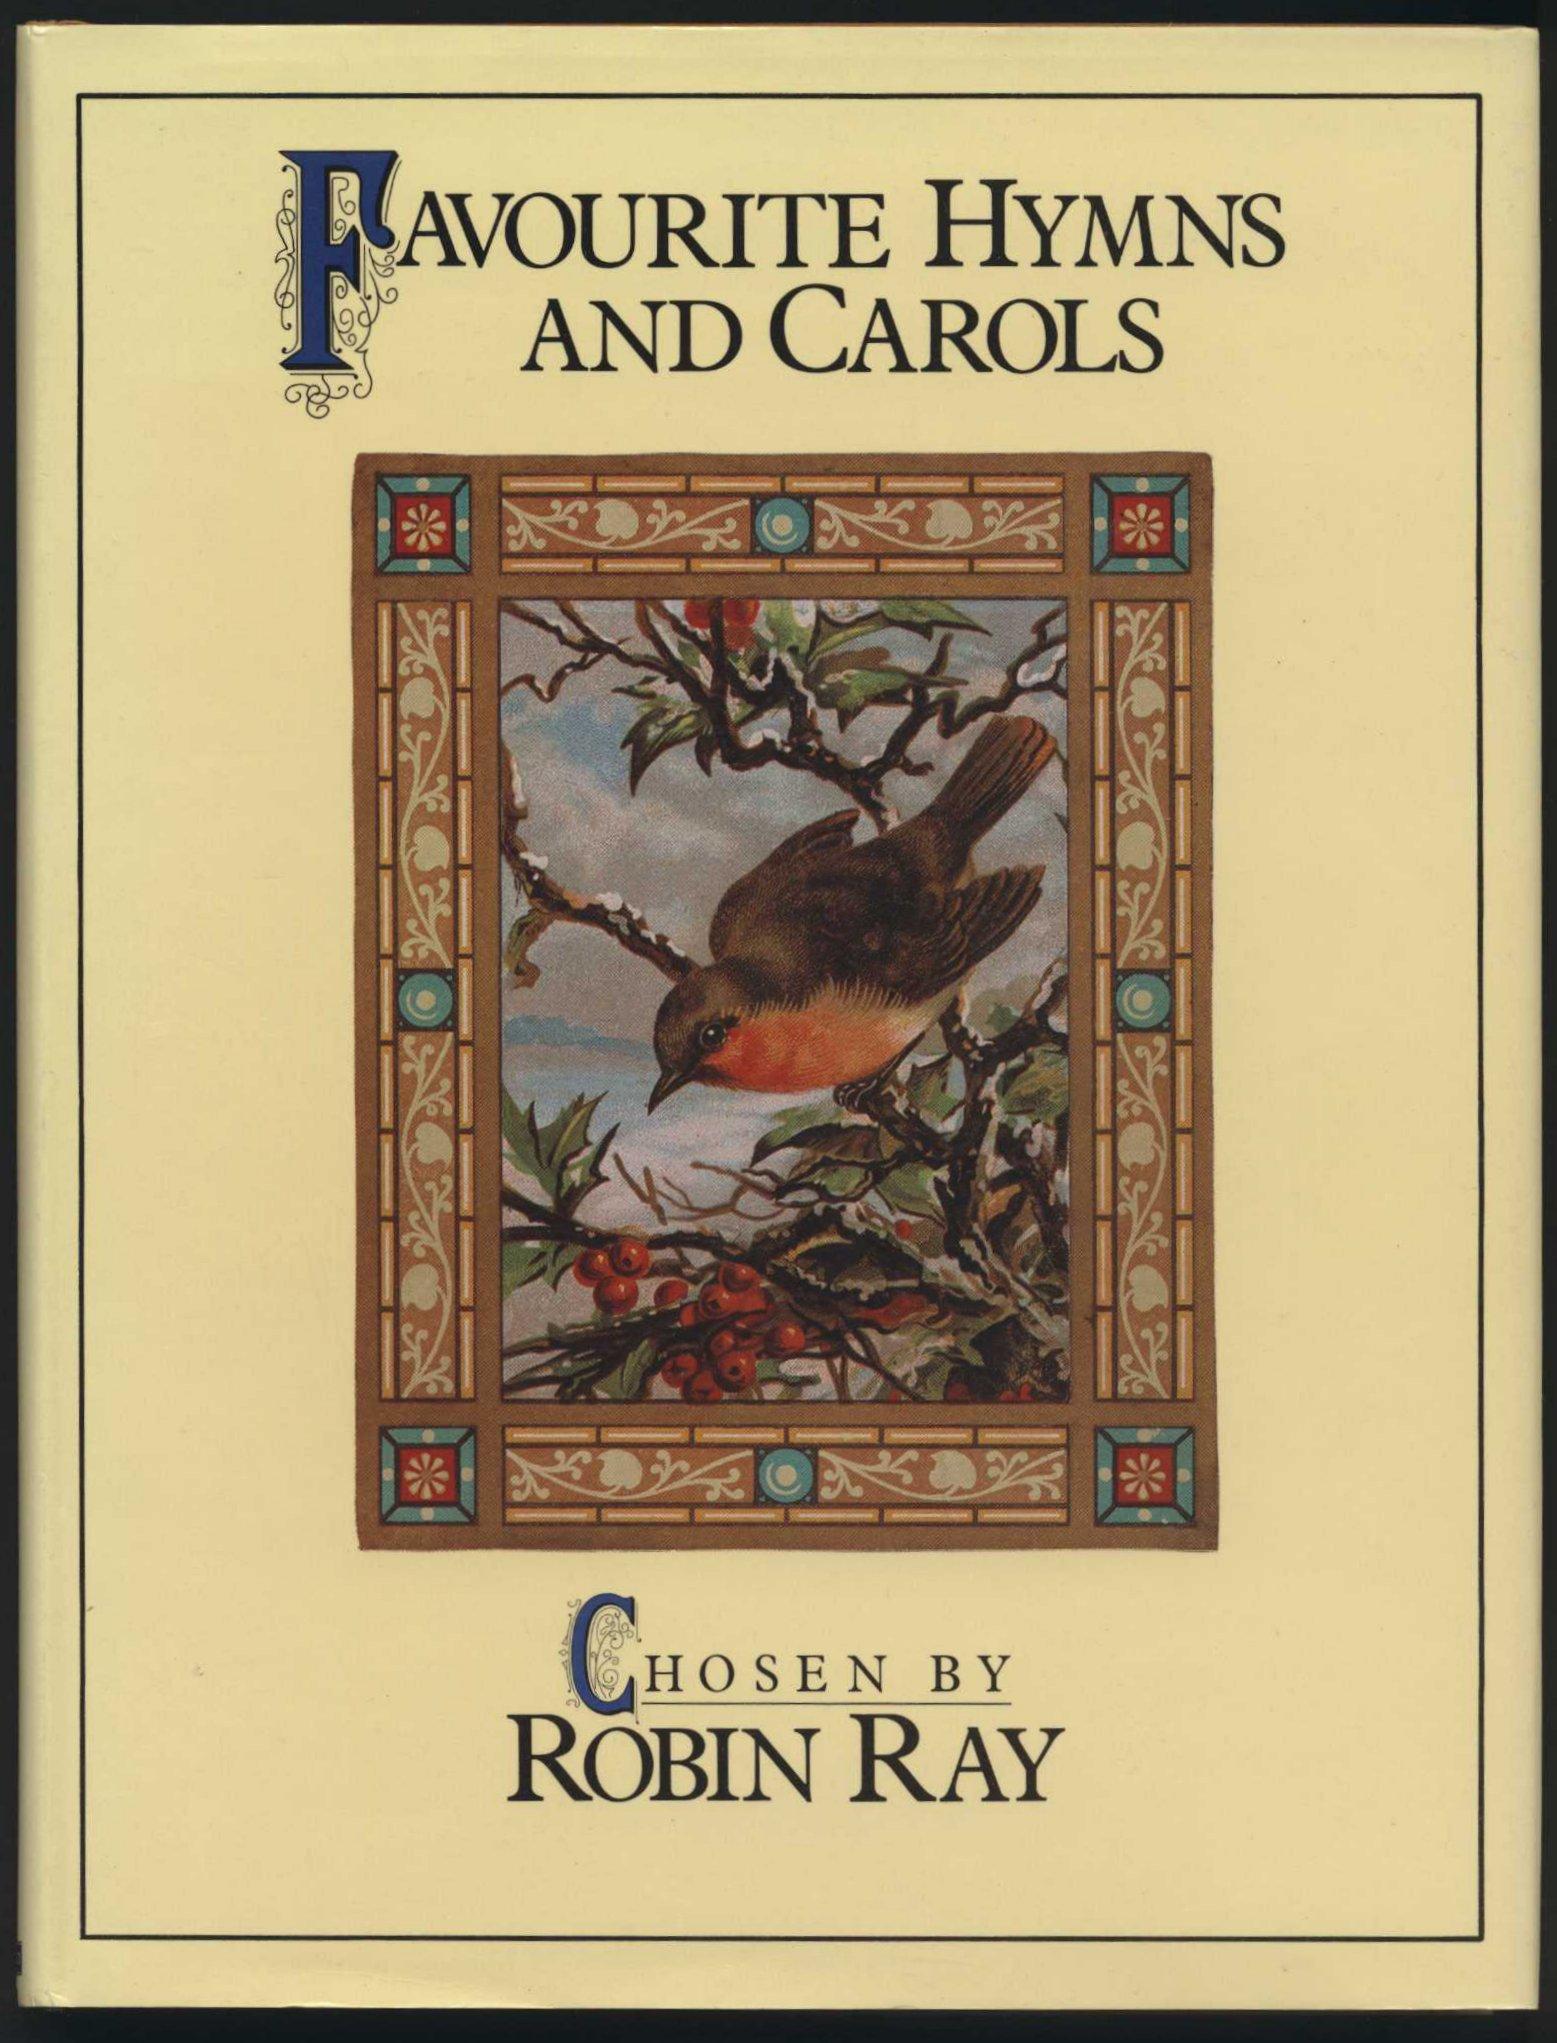 Favourite hymns and carols. London: Methuen, 1982.